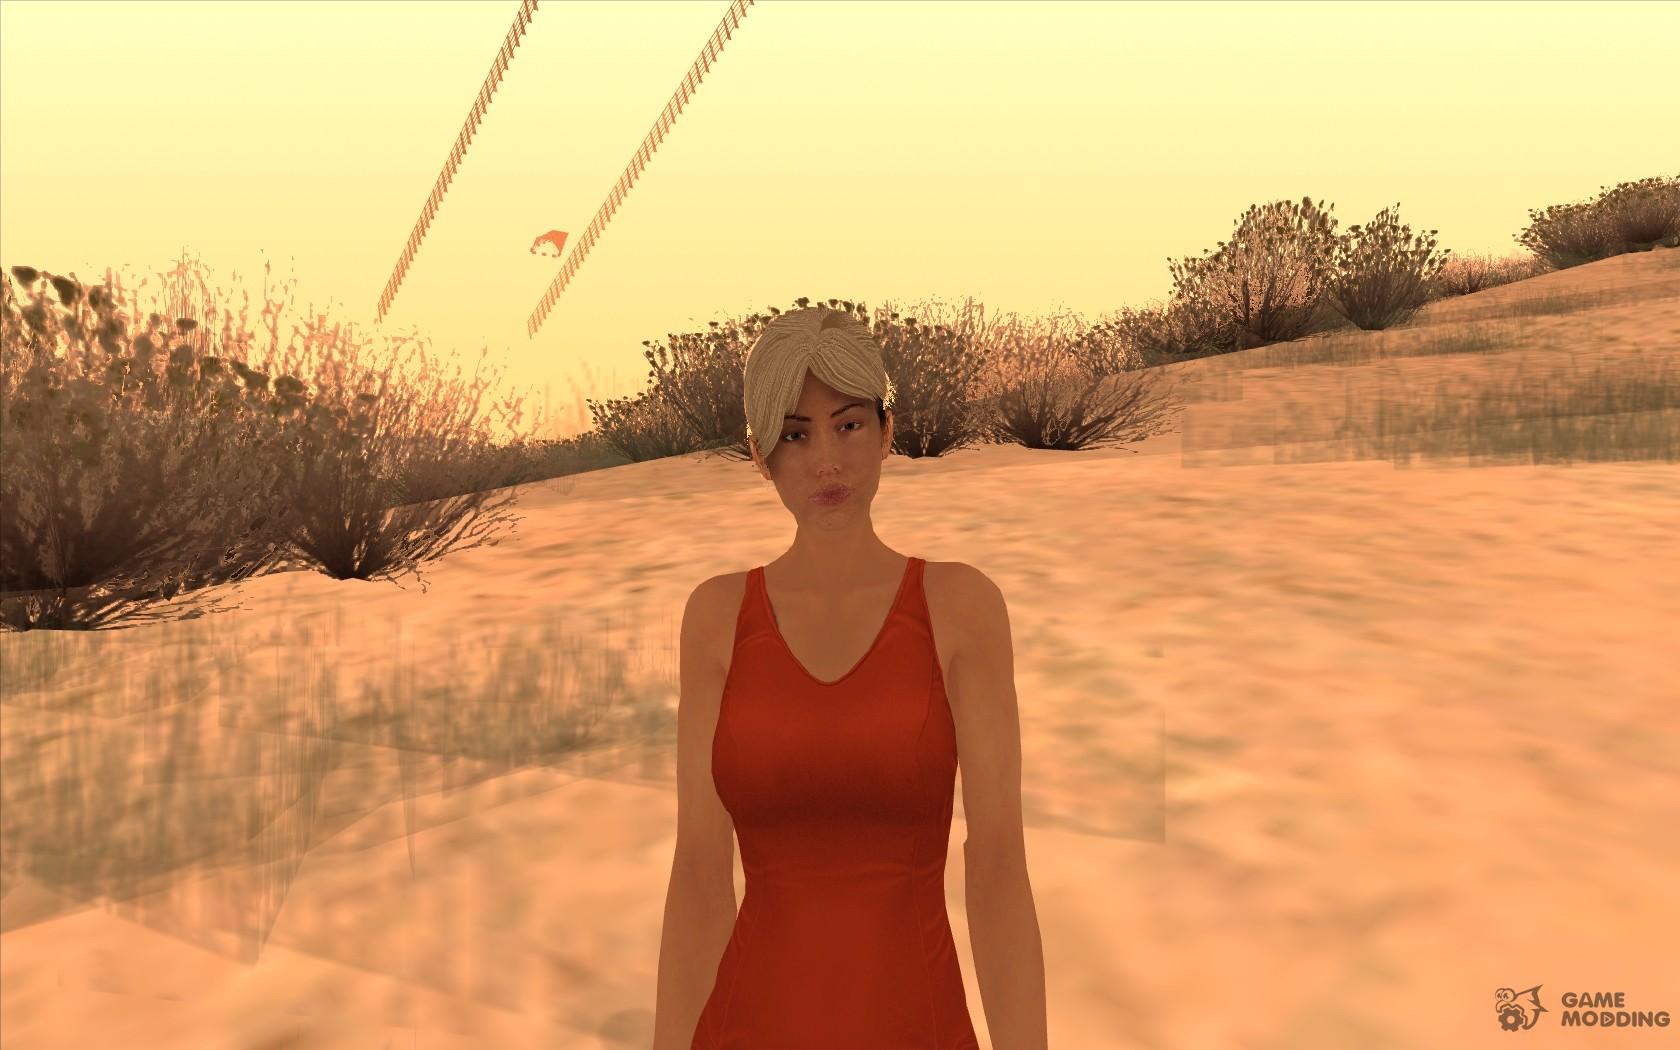 Gta San Andreas Nude | Hot Girl HD Wallpaper